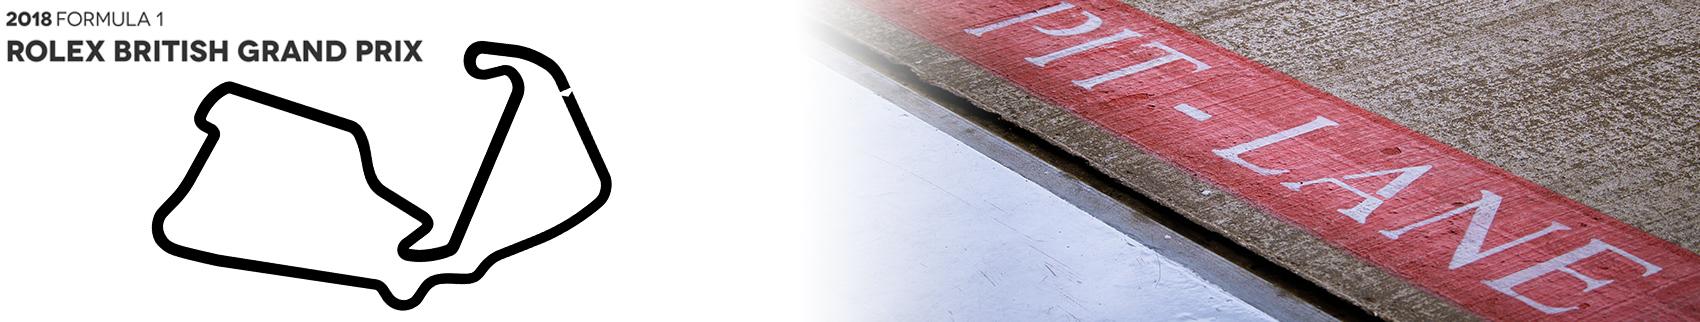 Silverstone GP